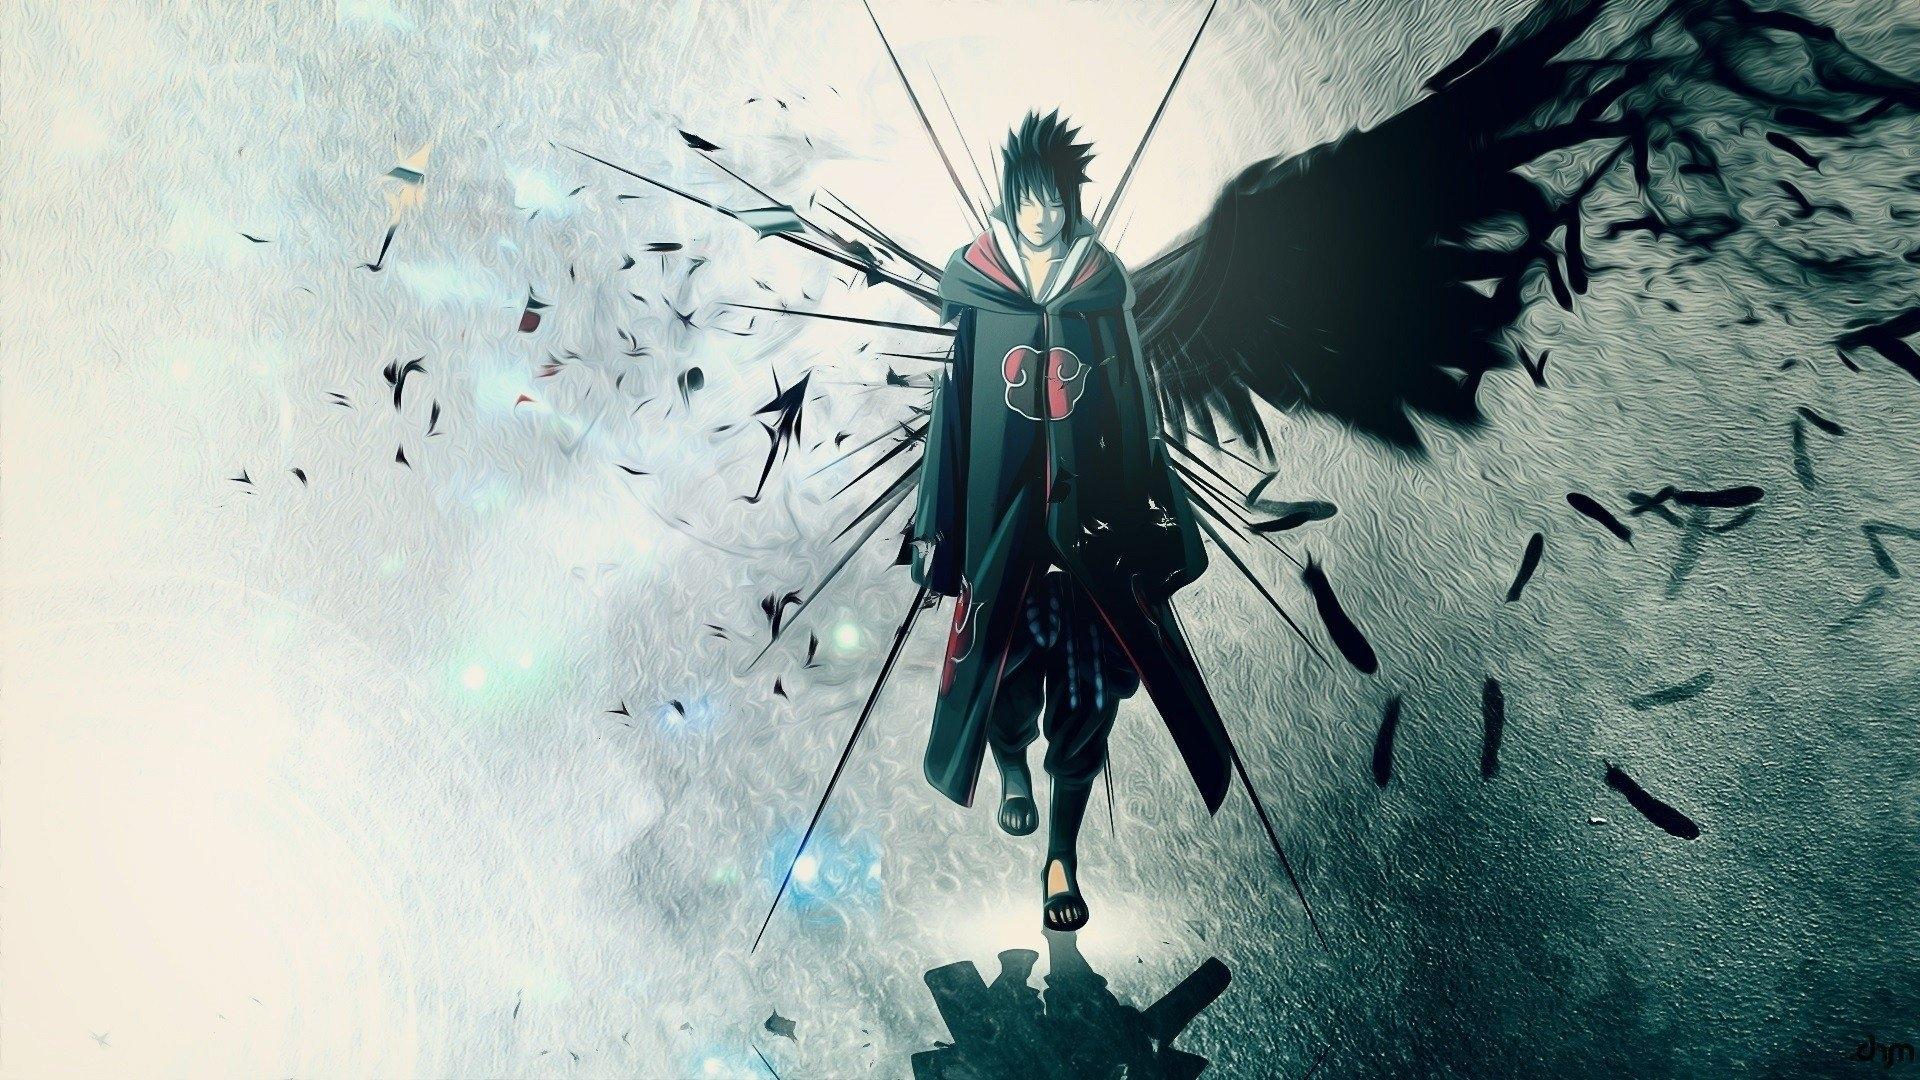 613 sasuke uchiha hd wallpapers | background images - wallpaper abyss